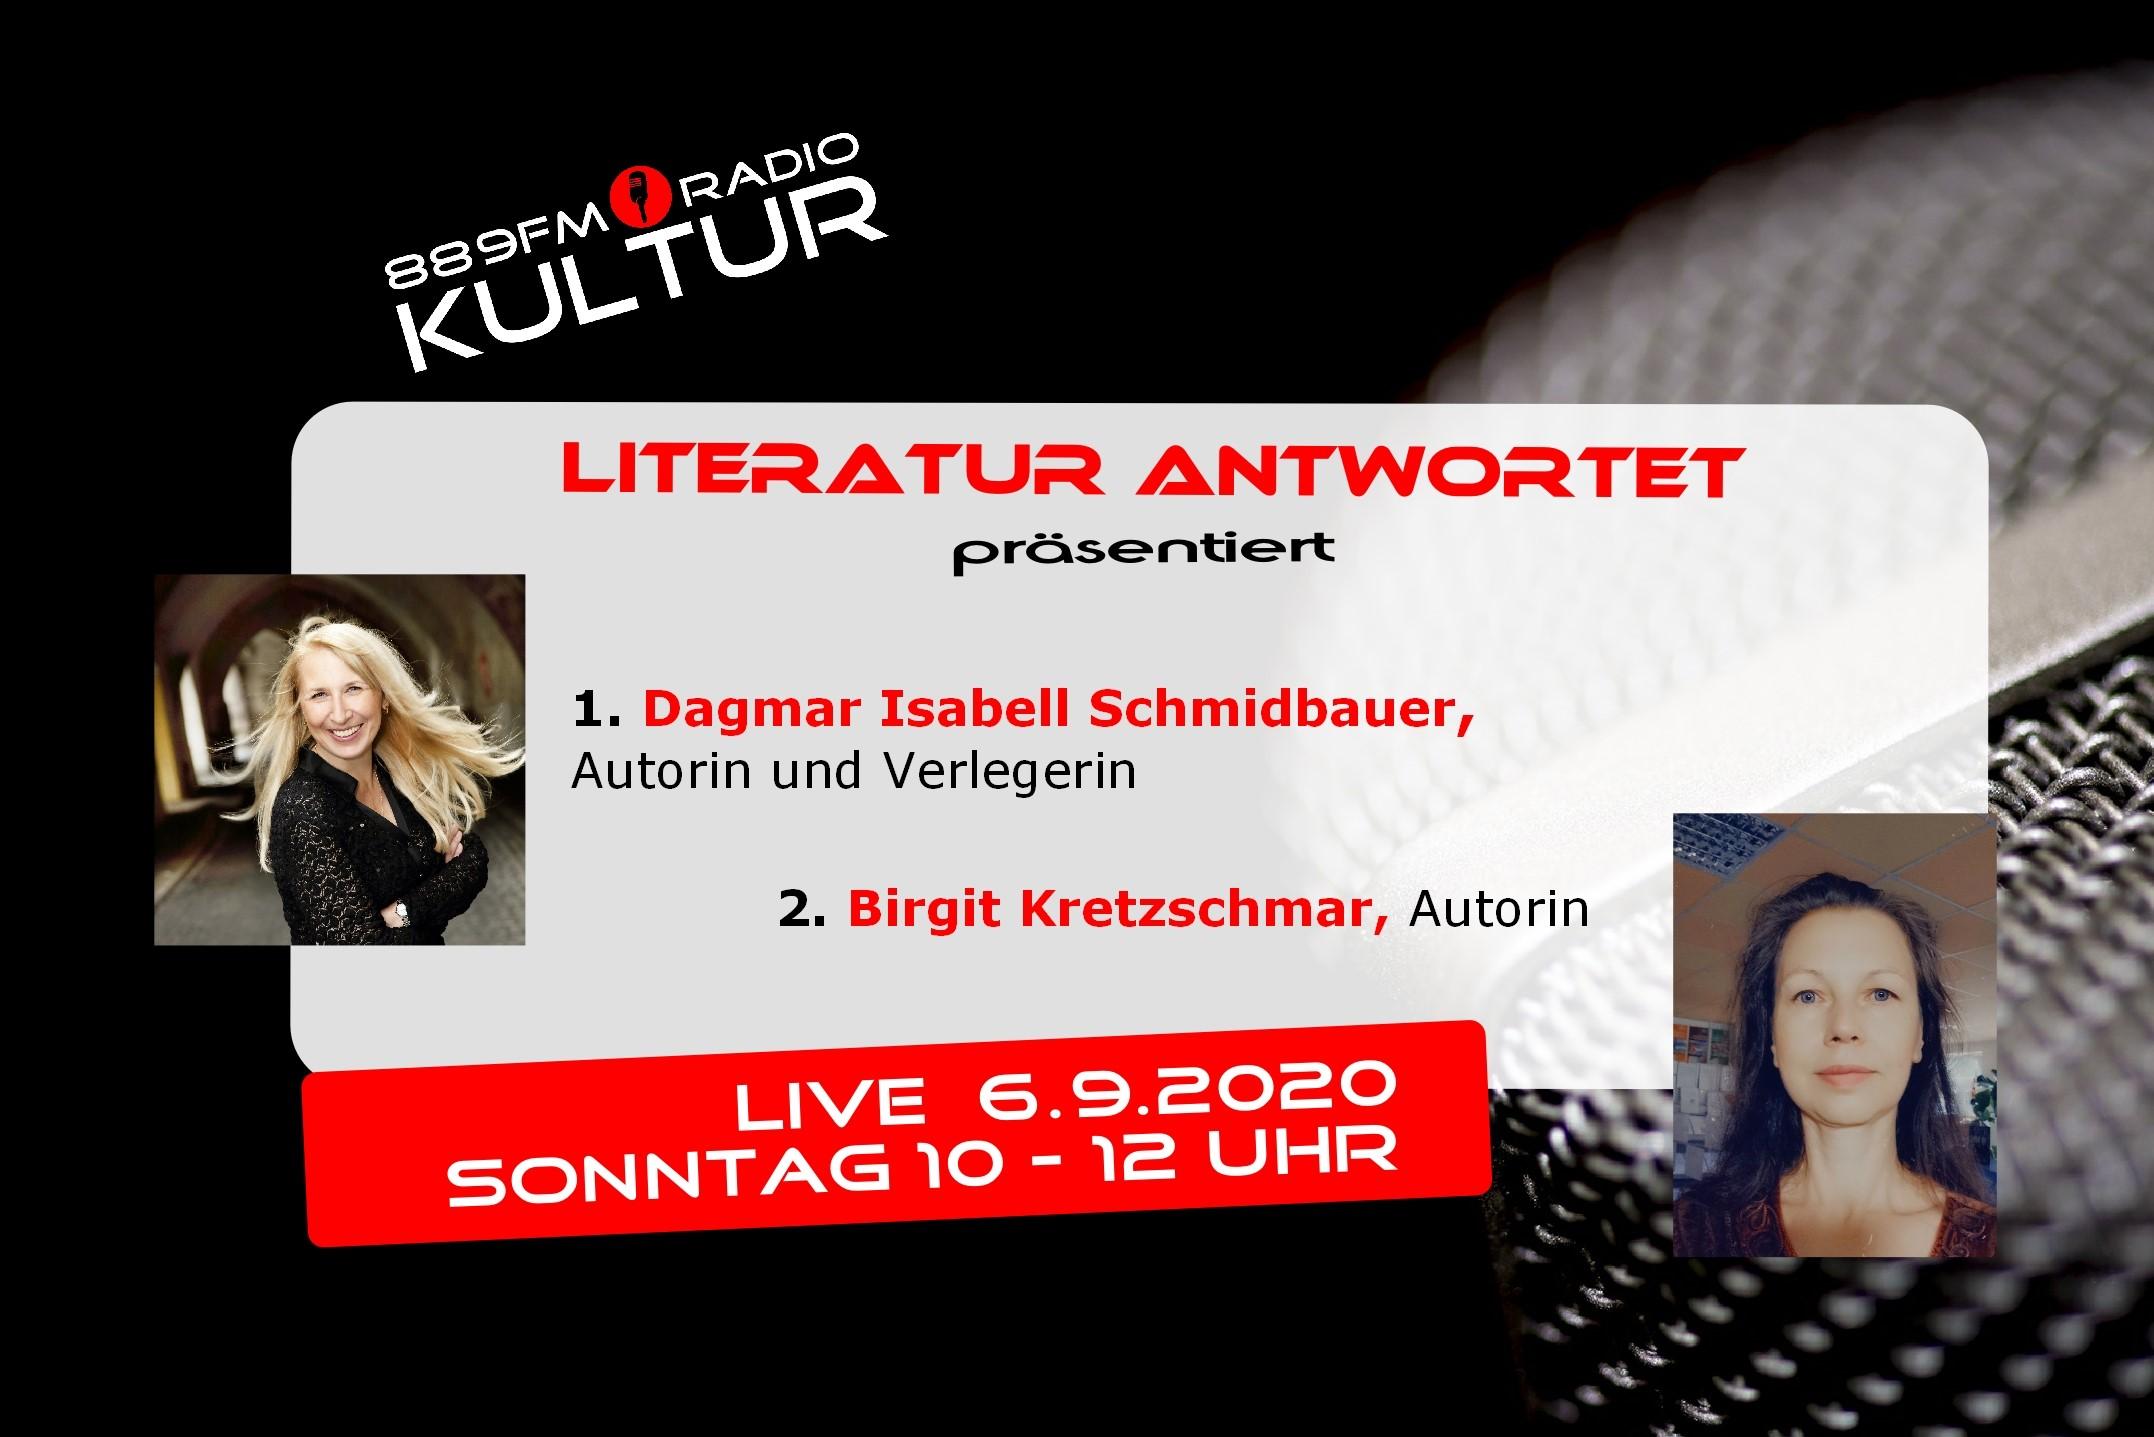 Radio 889FM Kultur, 889FM Kultur, Radio 889FM